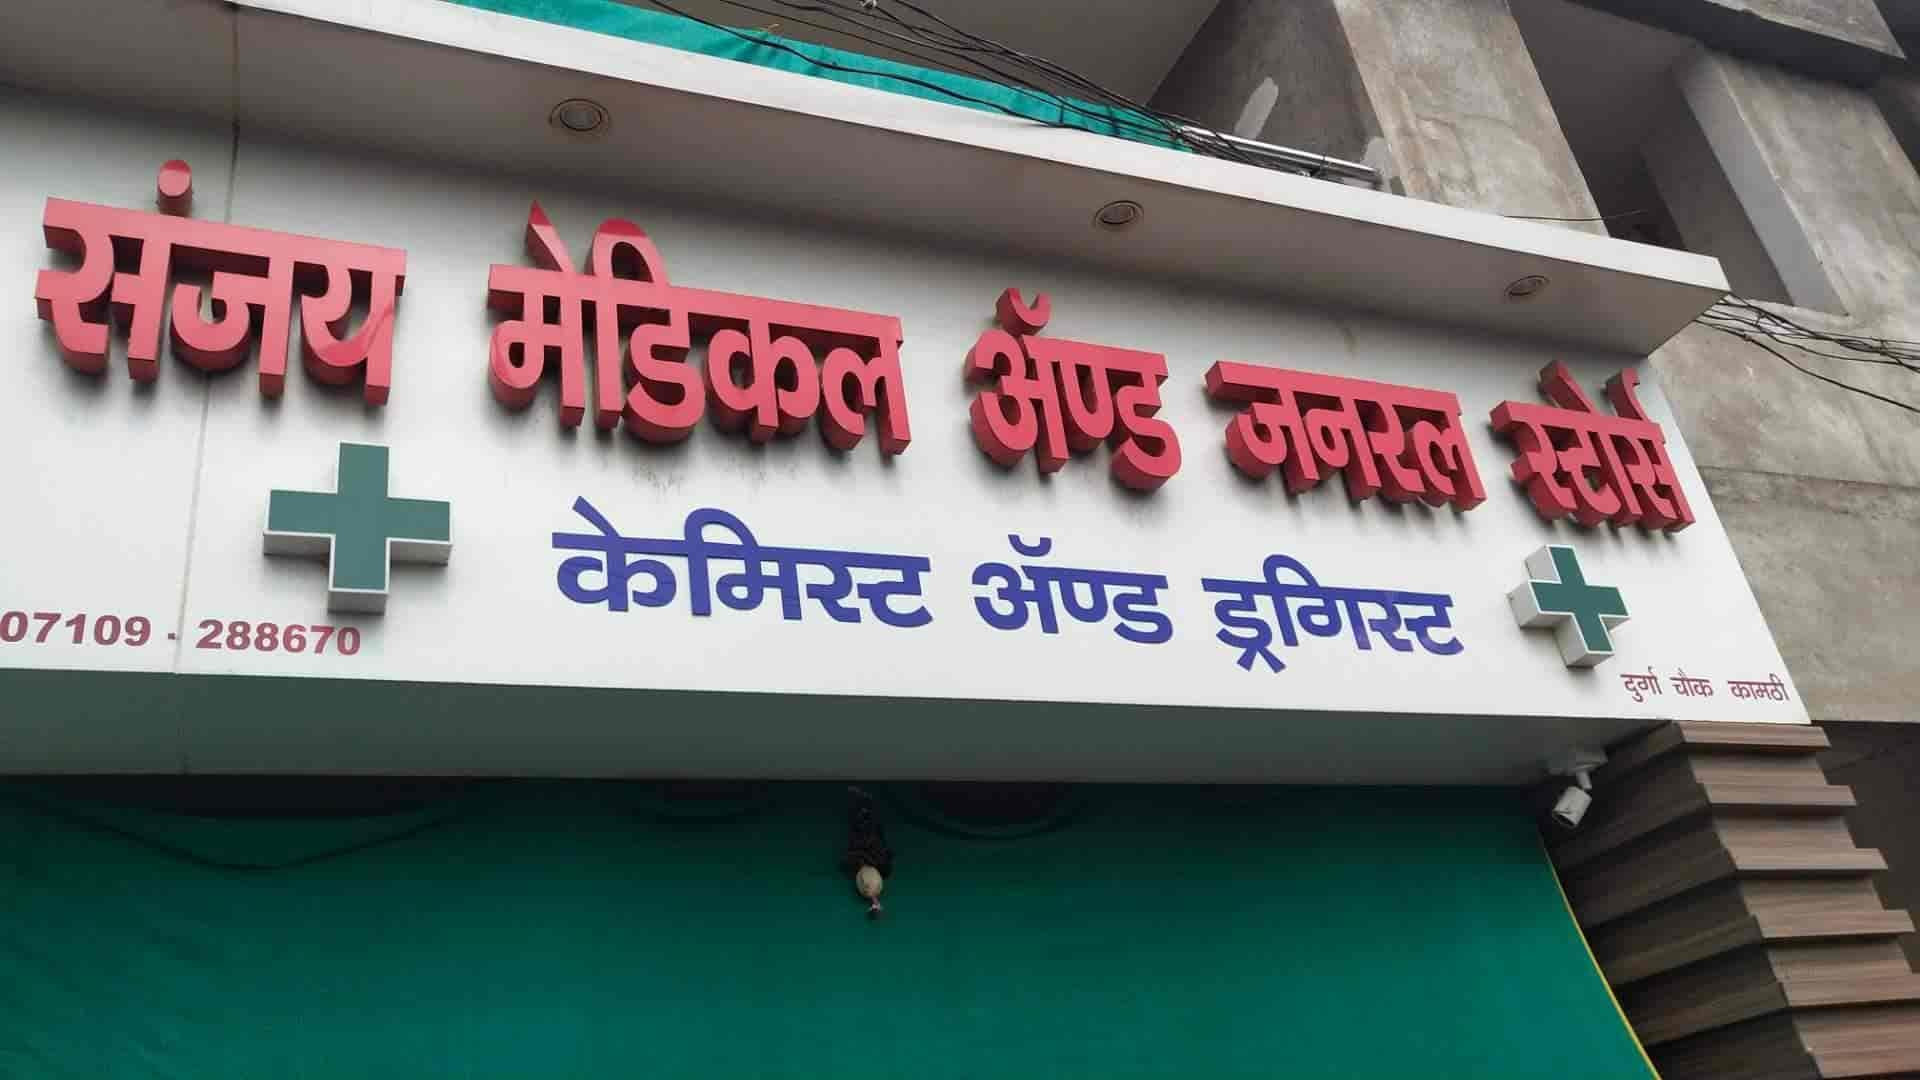 Sanjay Medi Gen Store Photos, Kamptee Road, Nagpur- Pictures